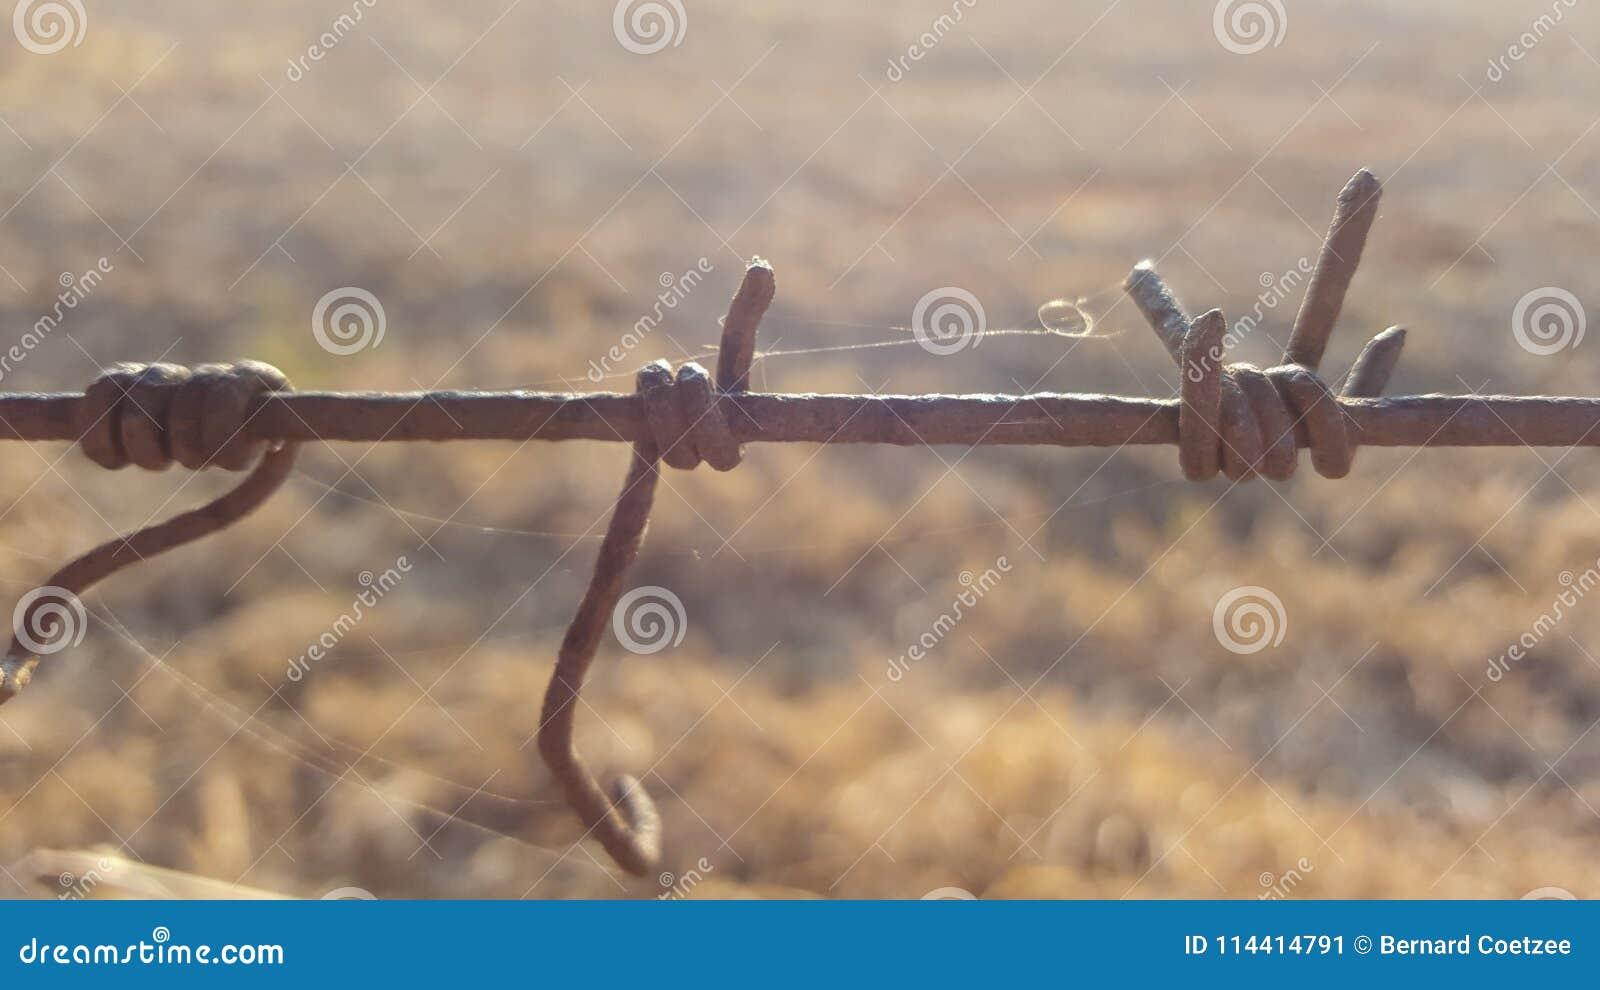 Weerhaakdraad tussen twee landbouwbedrijven in Zuid-Afrika